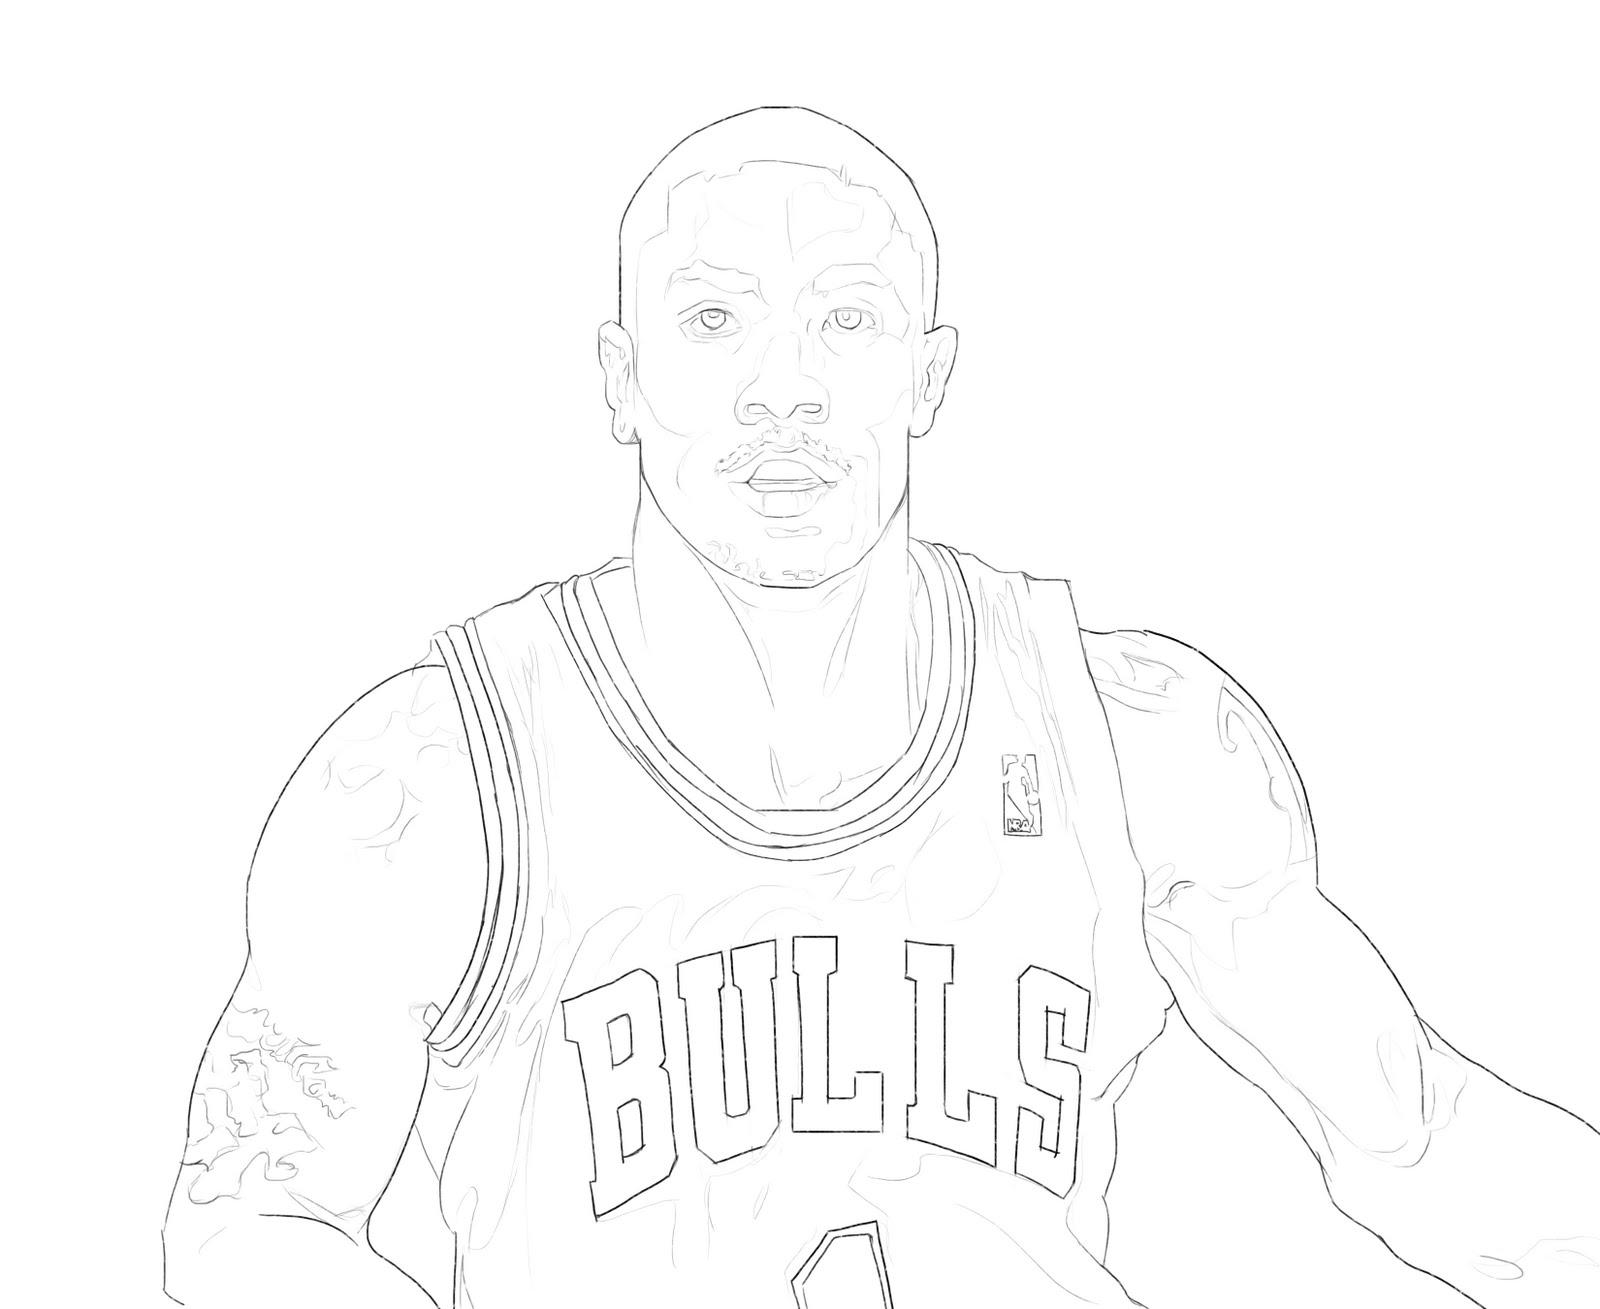 Starer Sketches In Color Celebrity big brother 2014